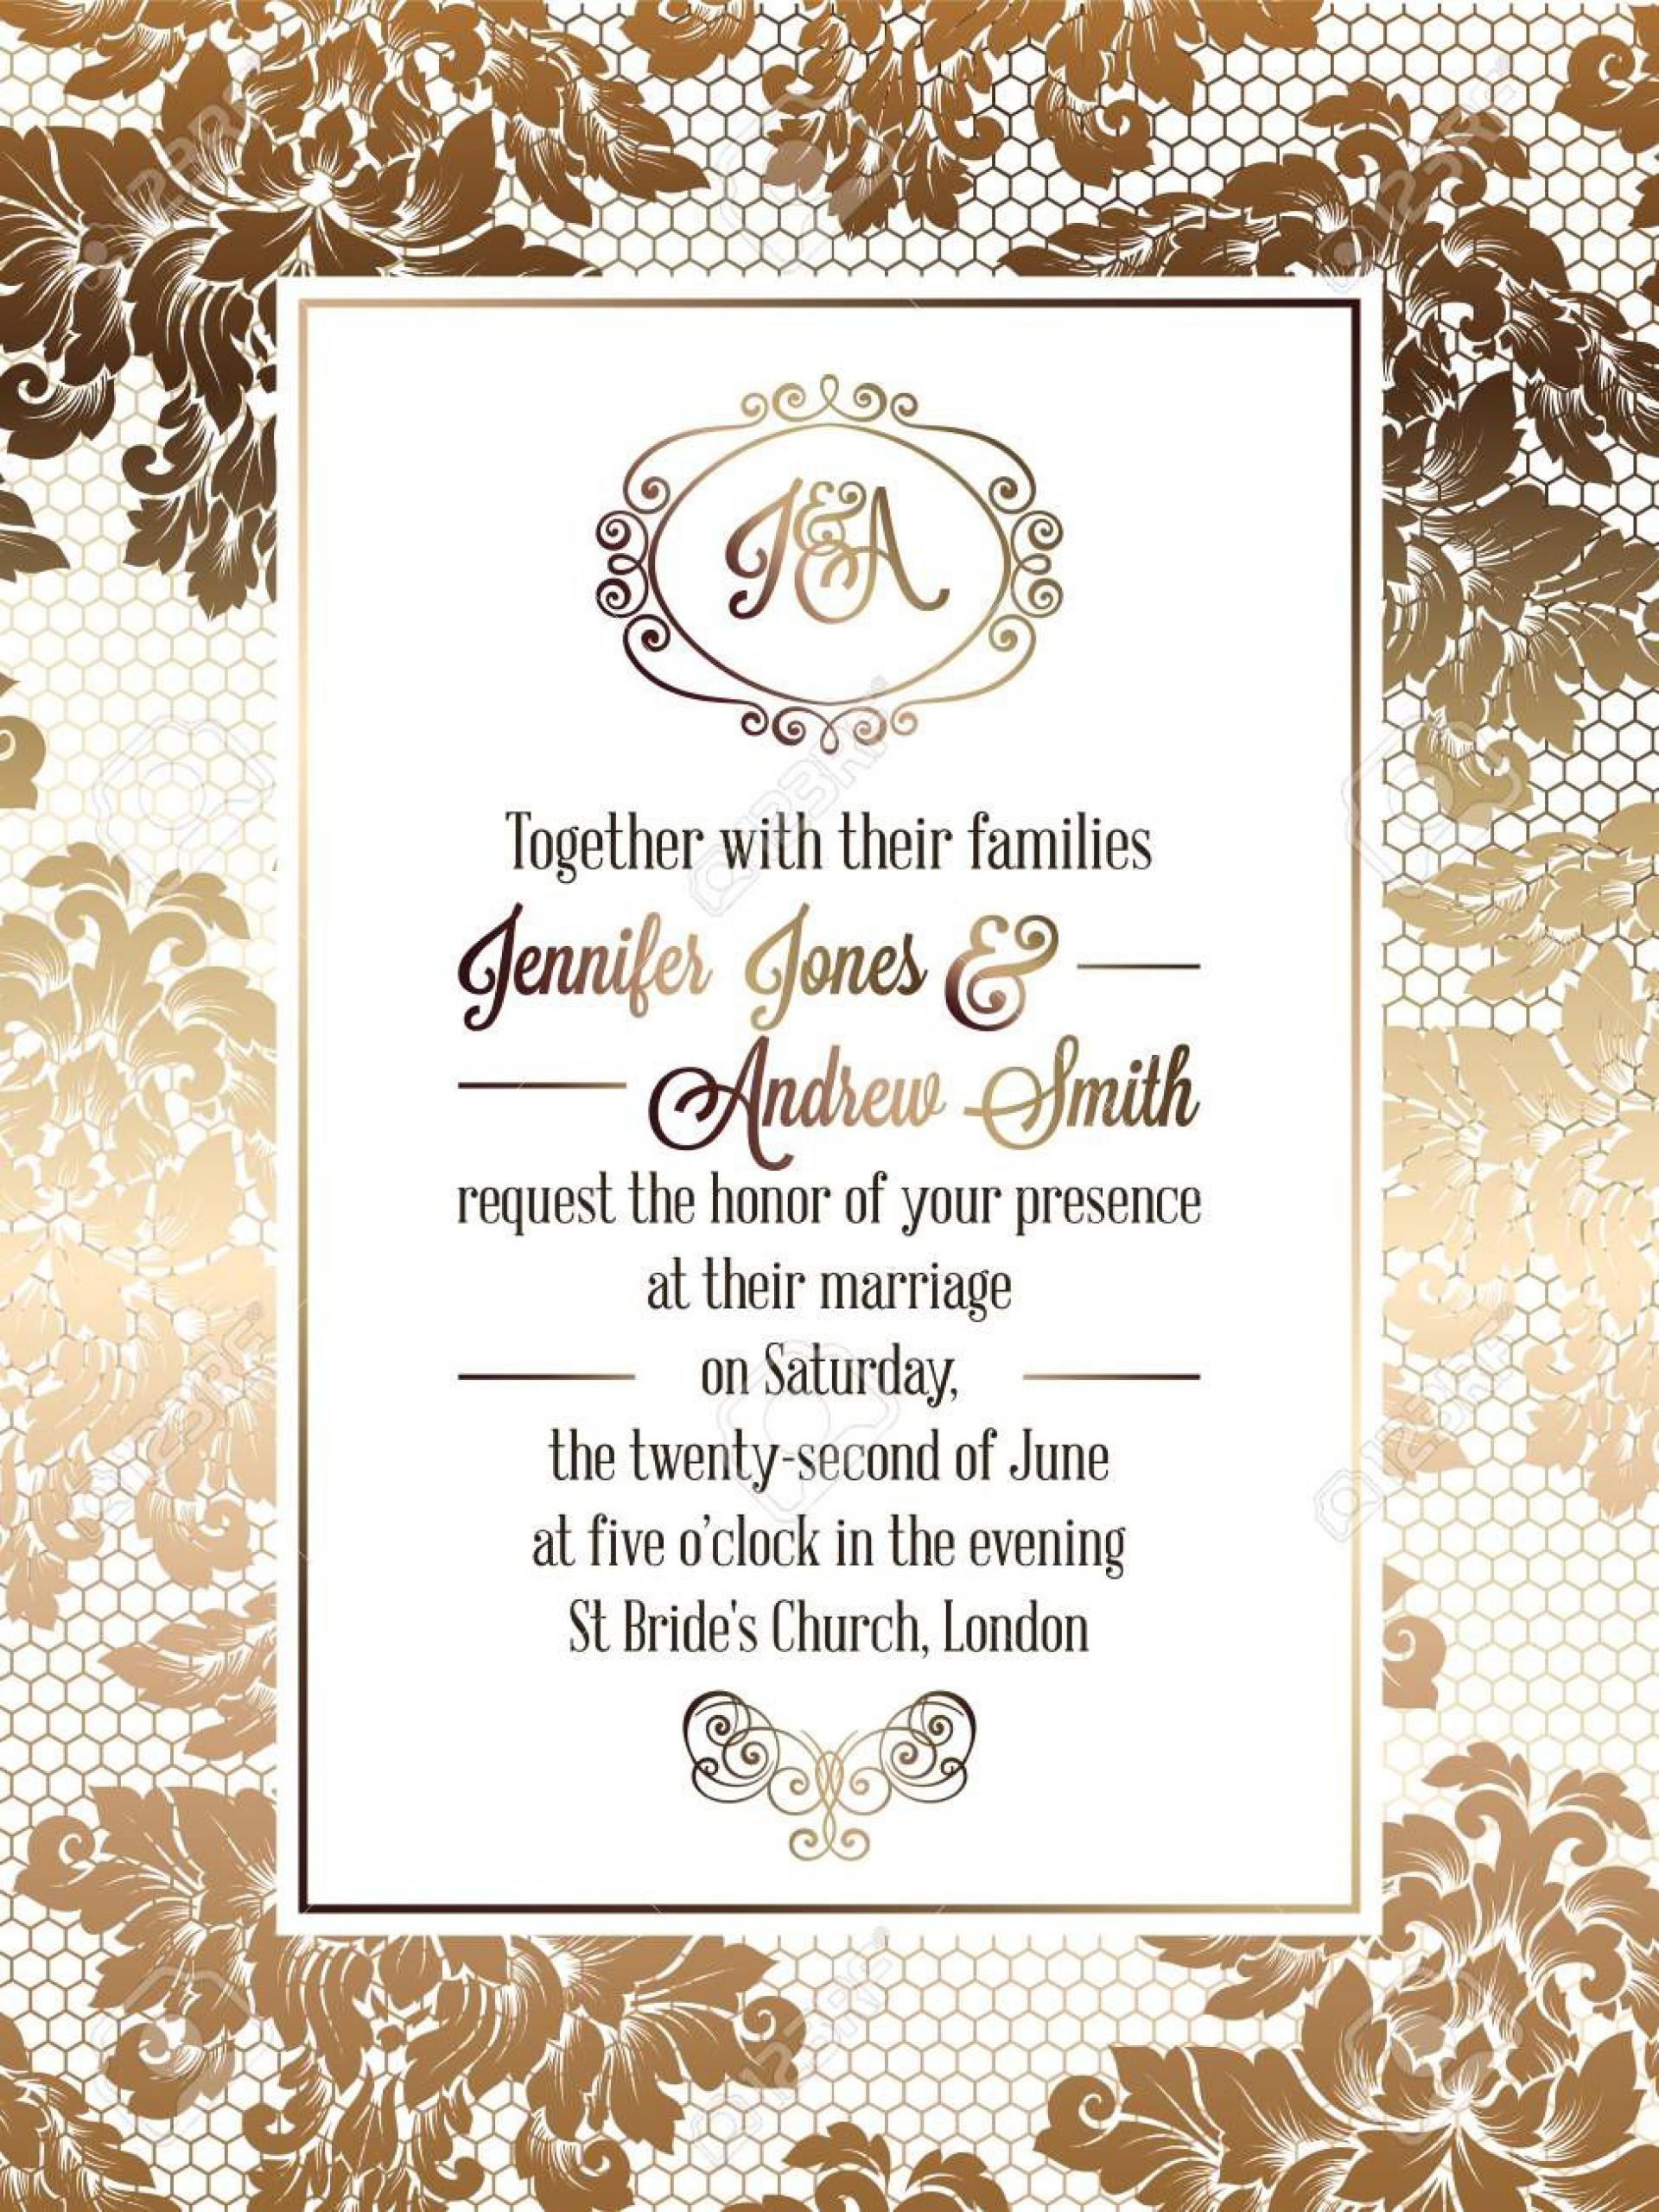 004 Top Elegant Wedding Menu Card Template Concept  Templates1920